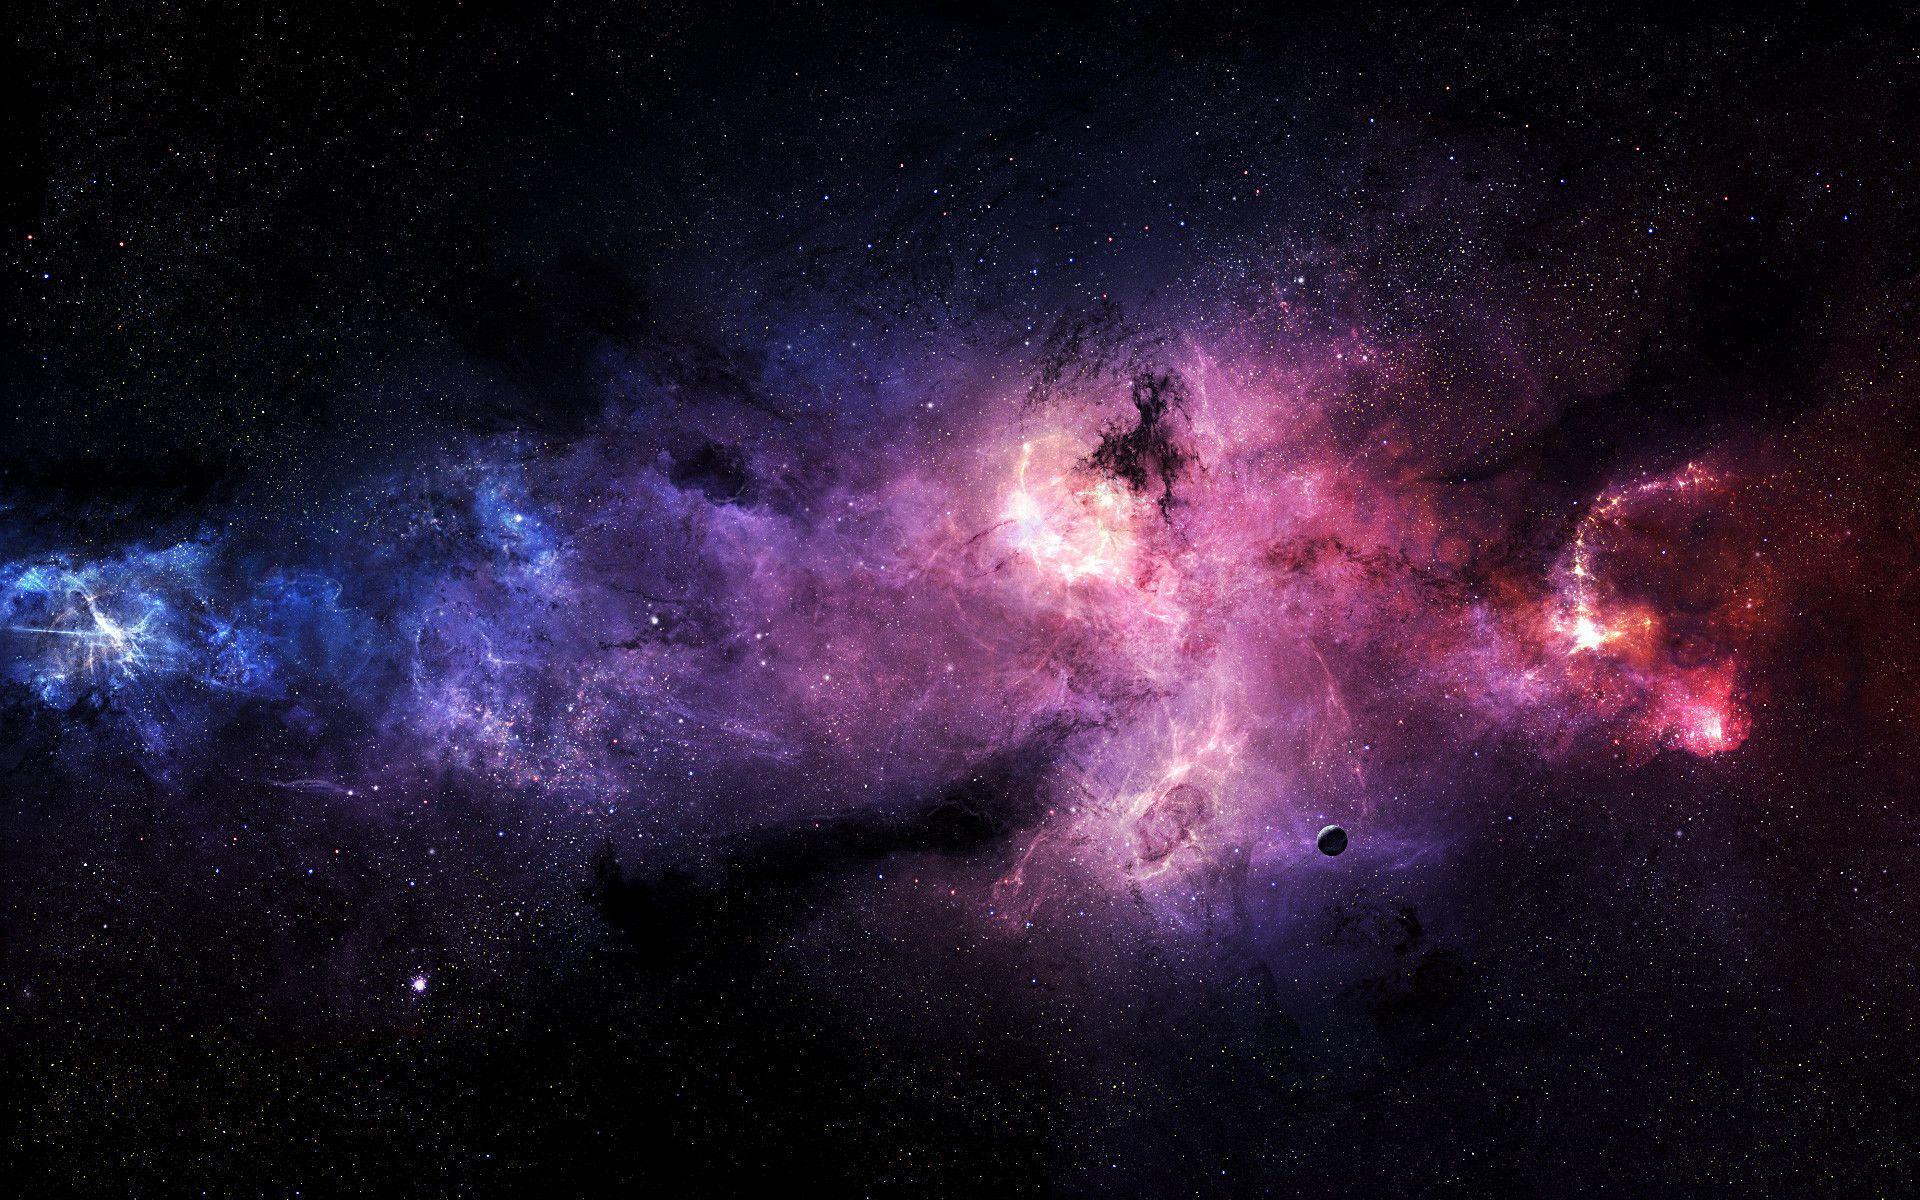 galaxy space hd wallpaper - photo #38